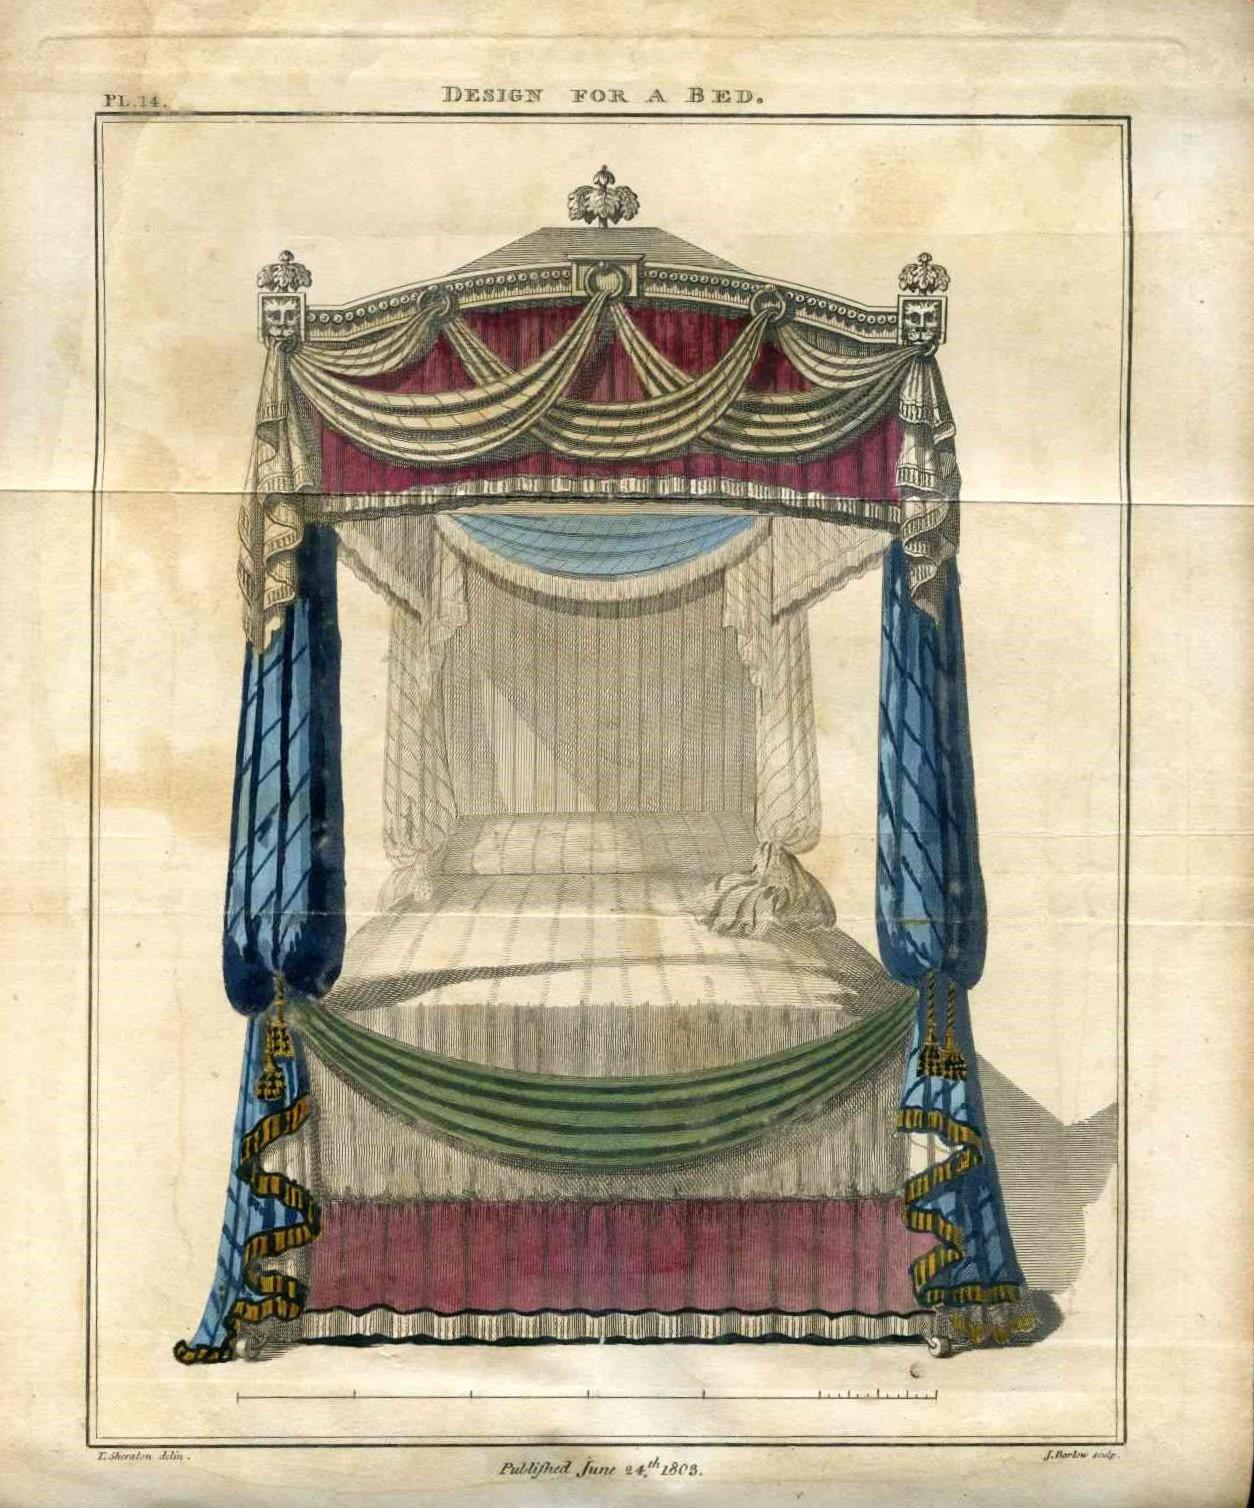 Sheraton Bed